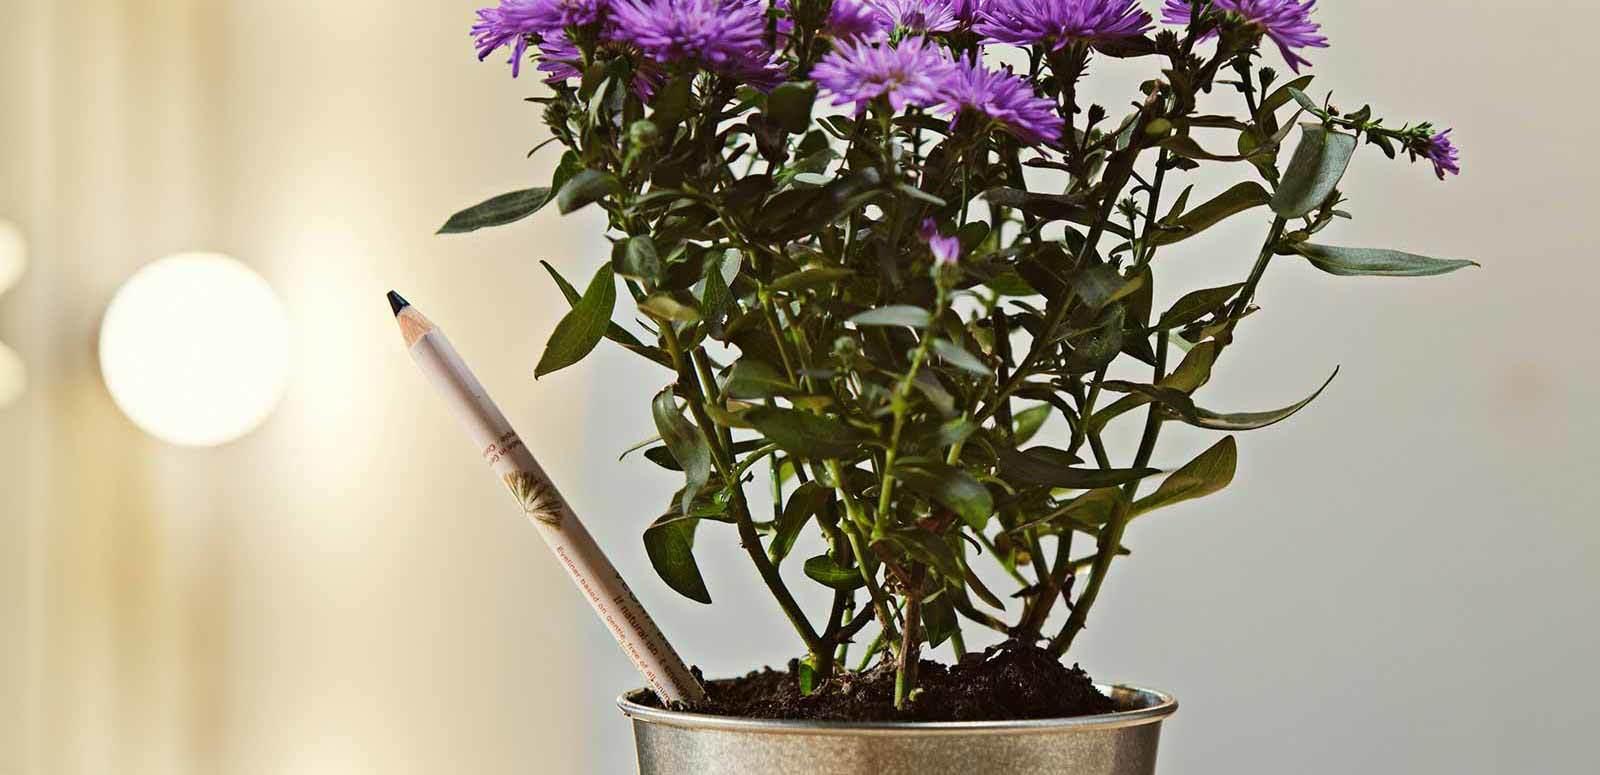 Sprout lapiceros ecológicos para plantar